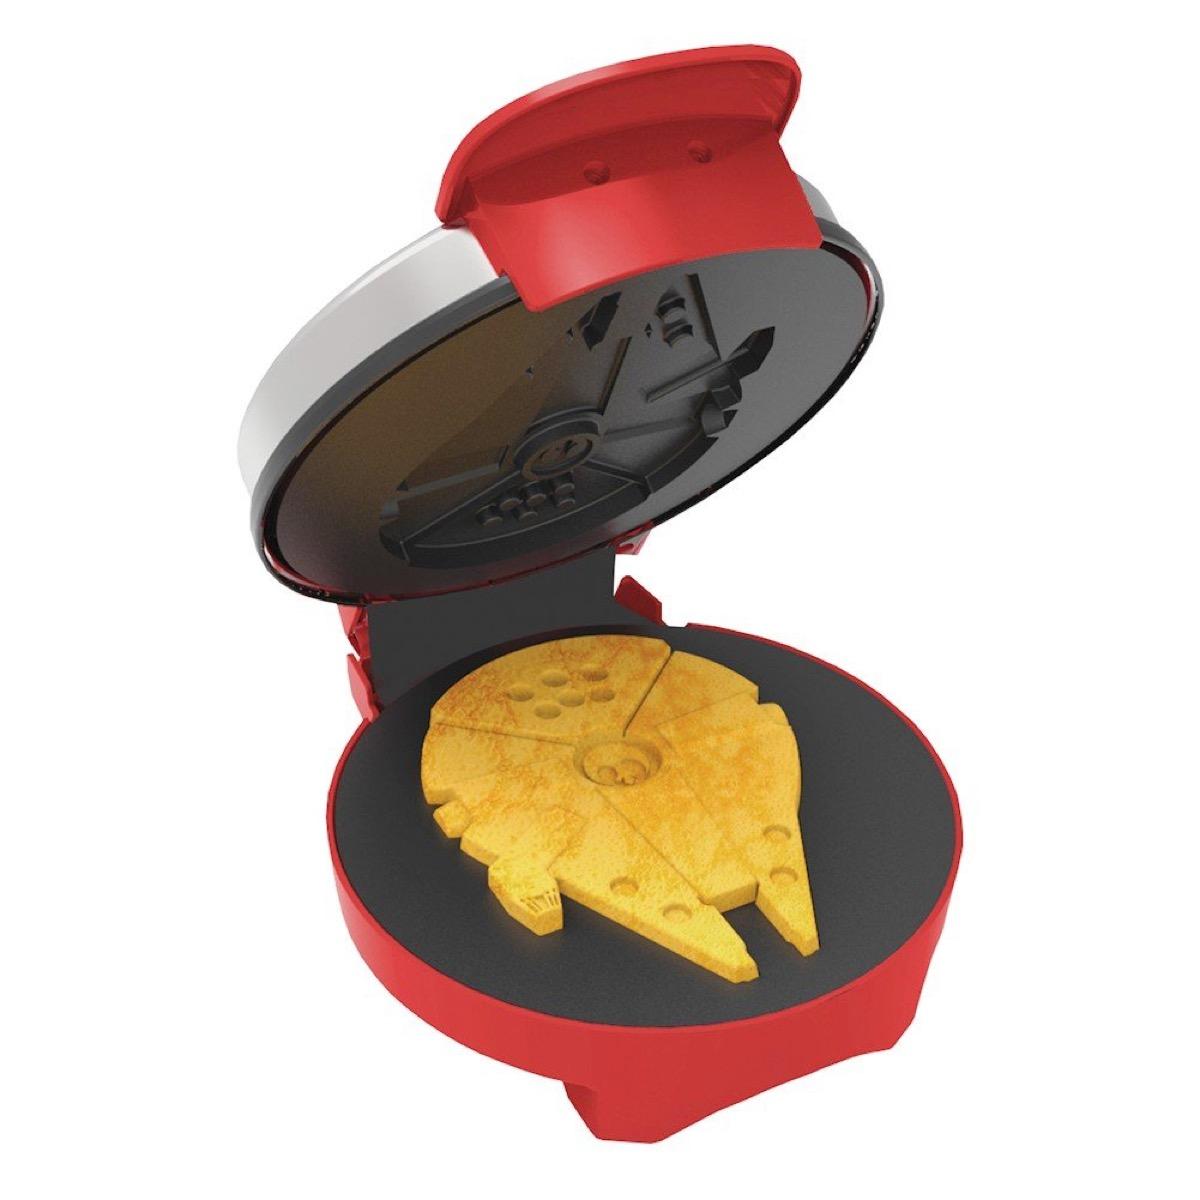 star wars waffle maker